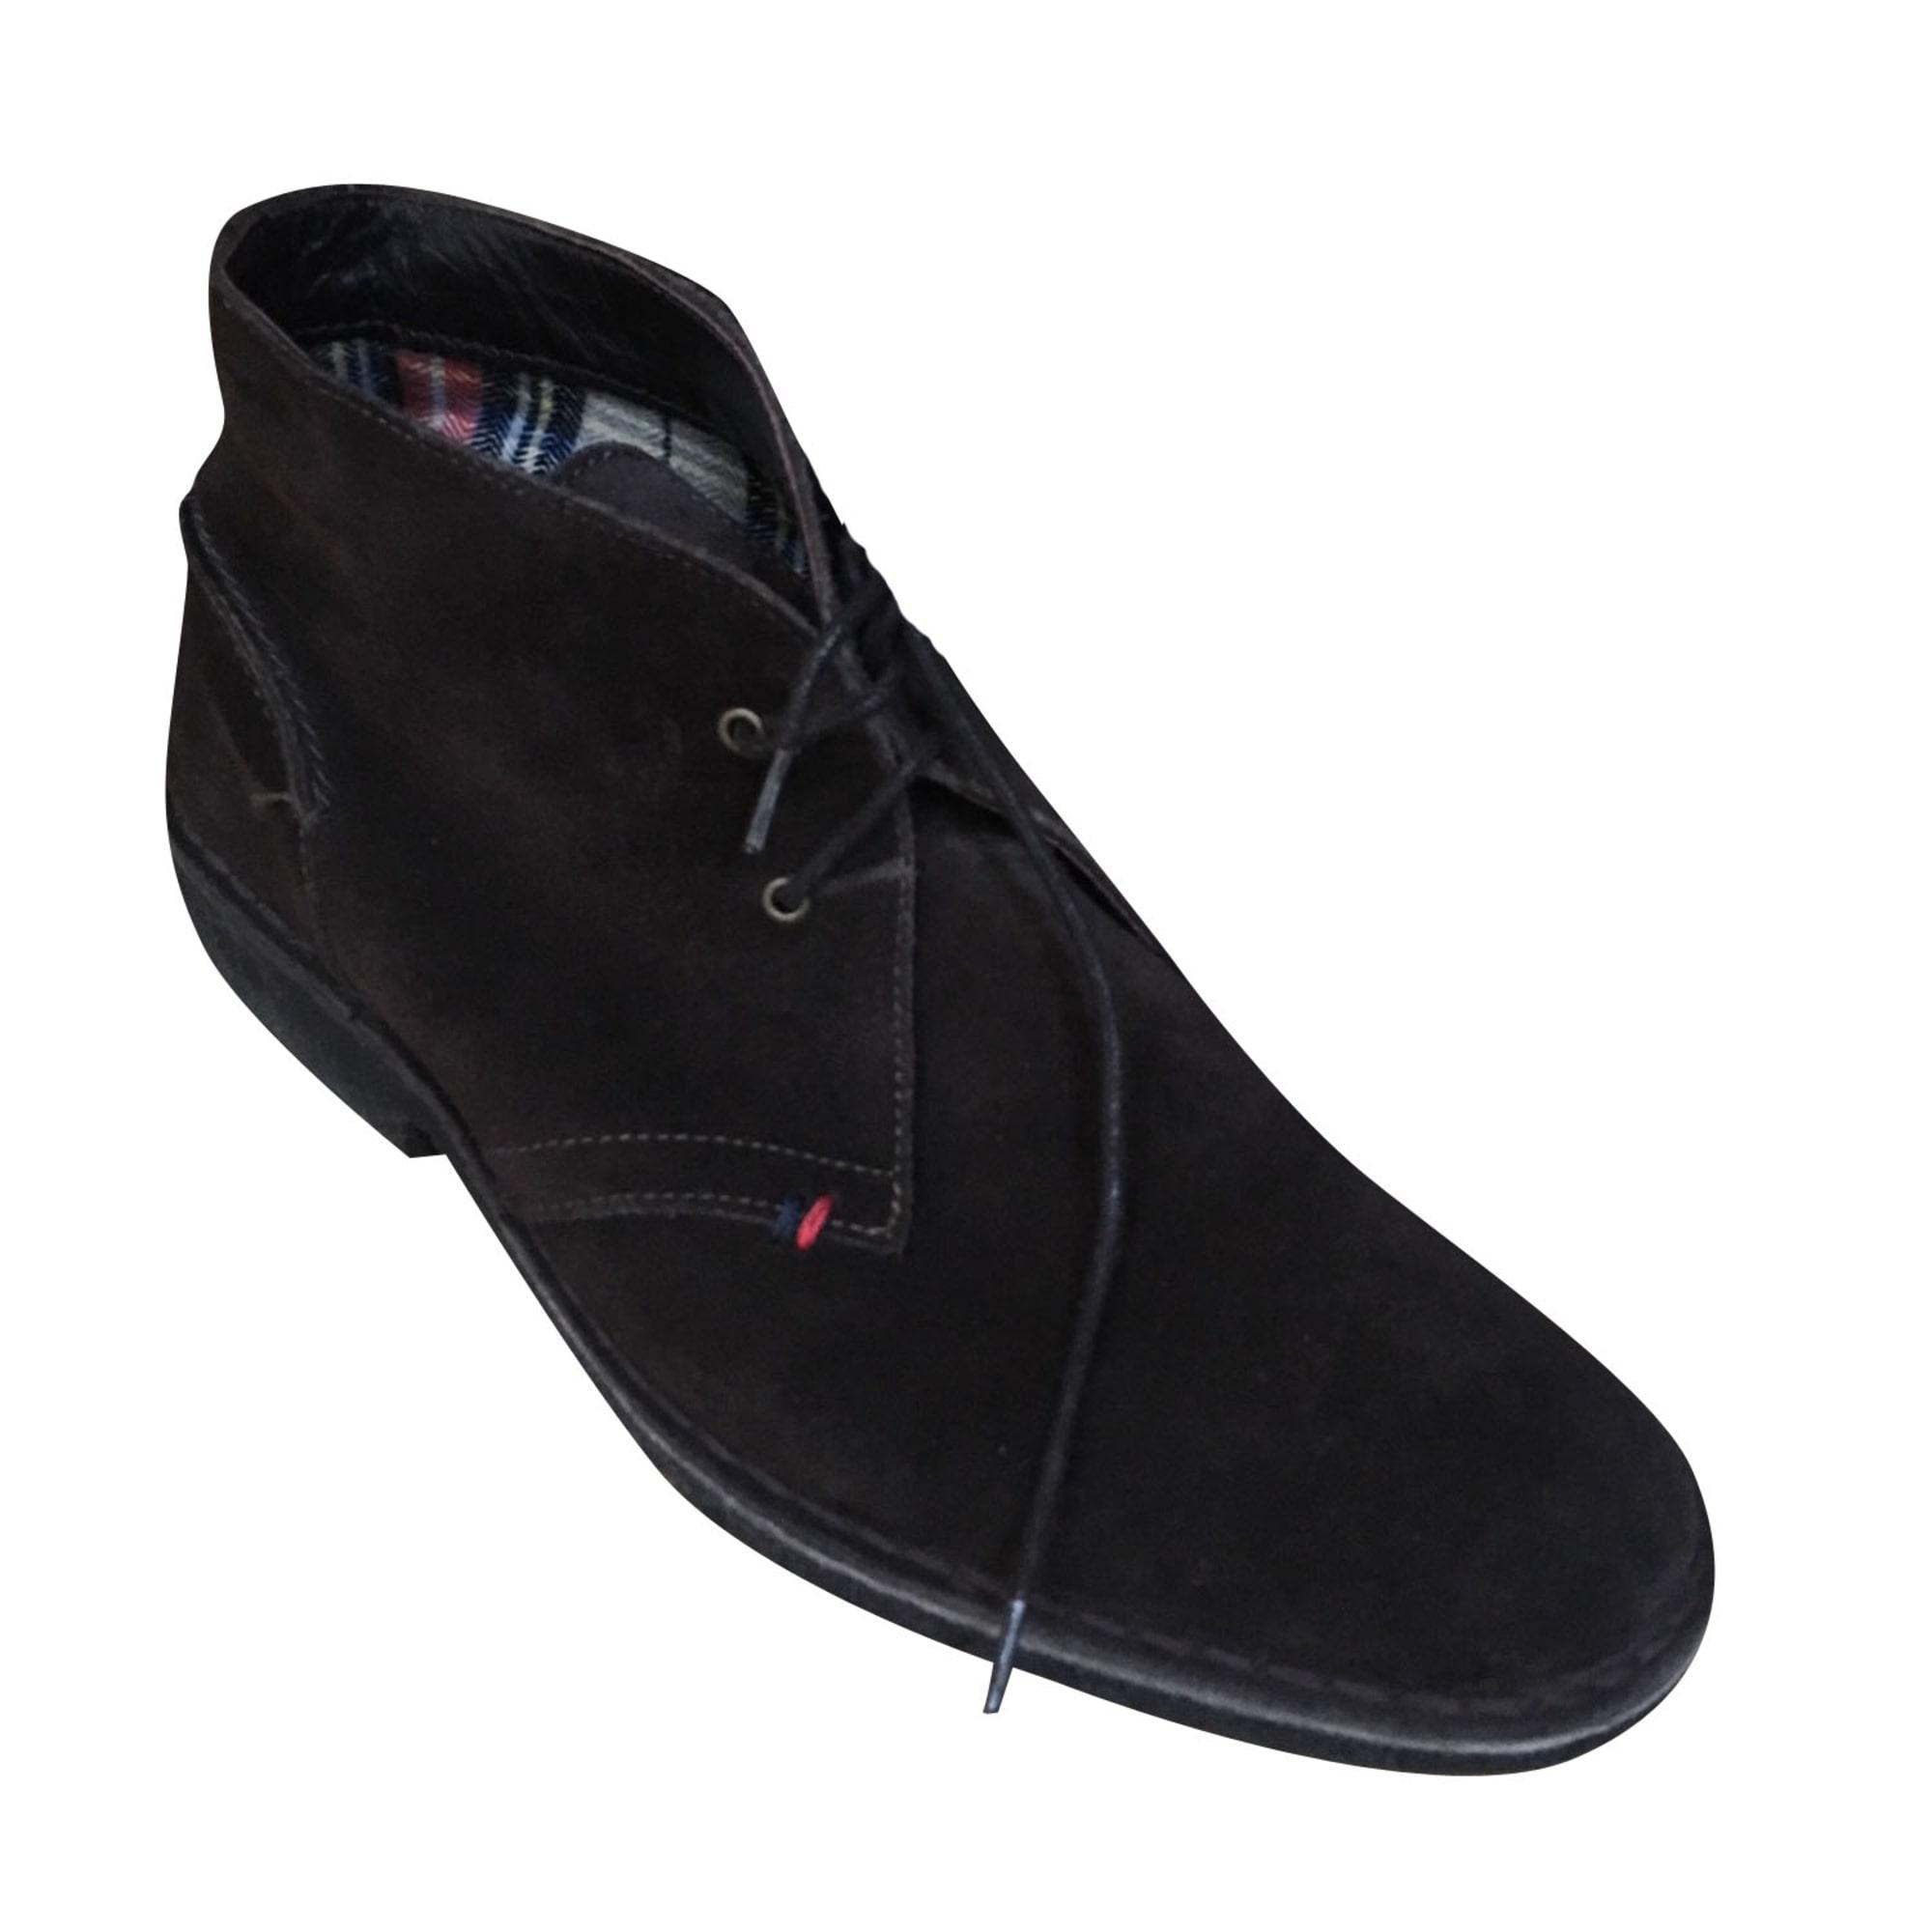 f21936634fcac2 Chaussures à lacets TOMMY HILFIGER 45 marron - 7609504